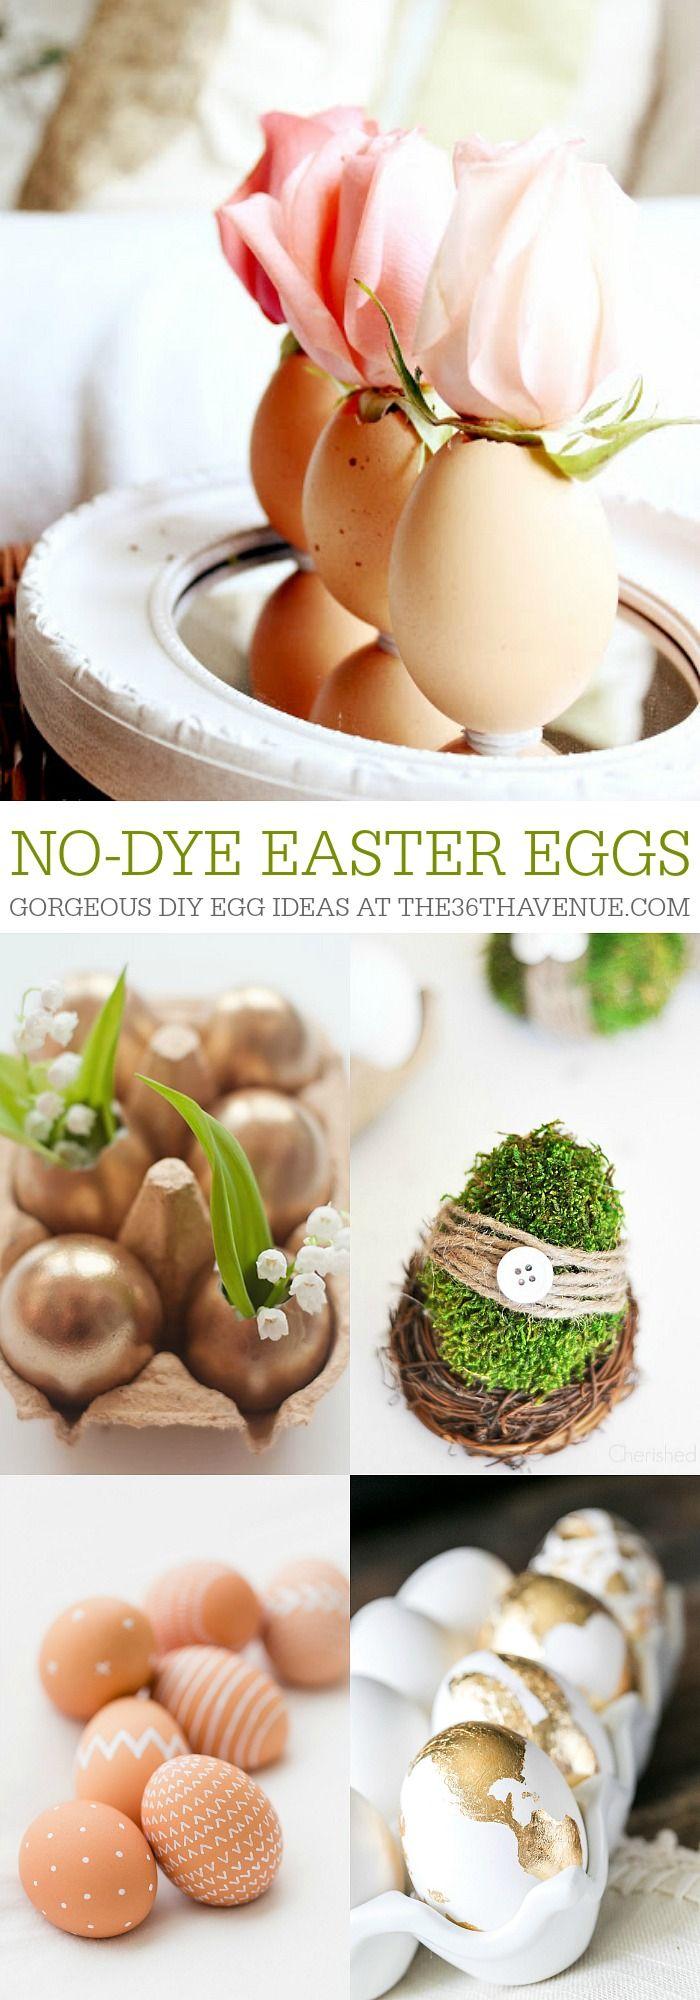 No Dye Easter Egg Tutorials at the36thavenue.com